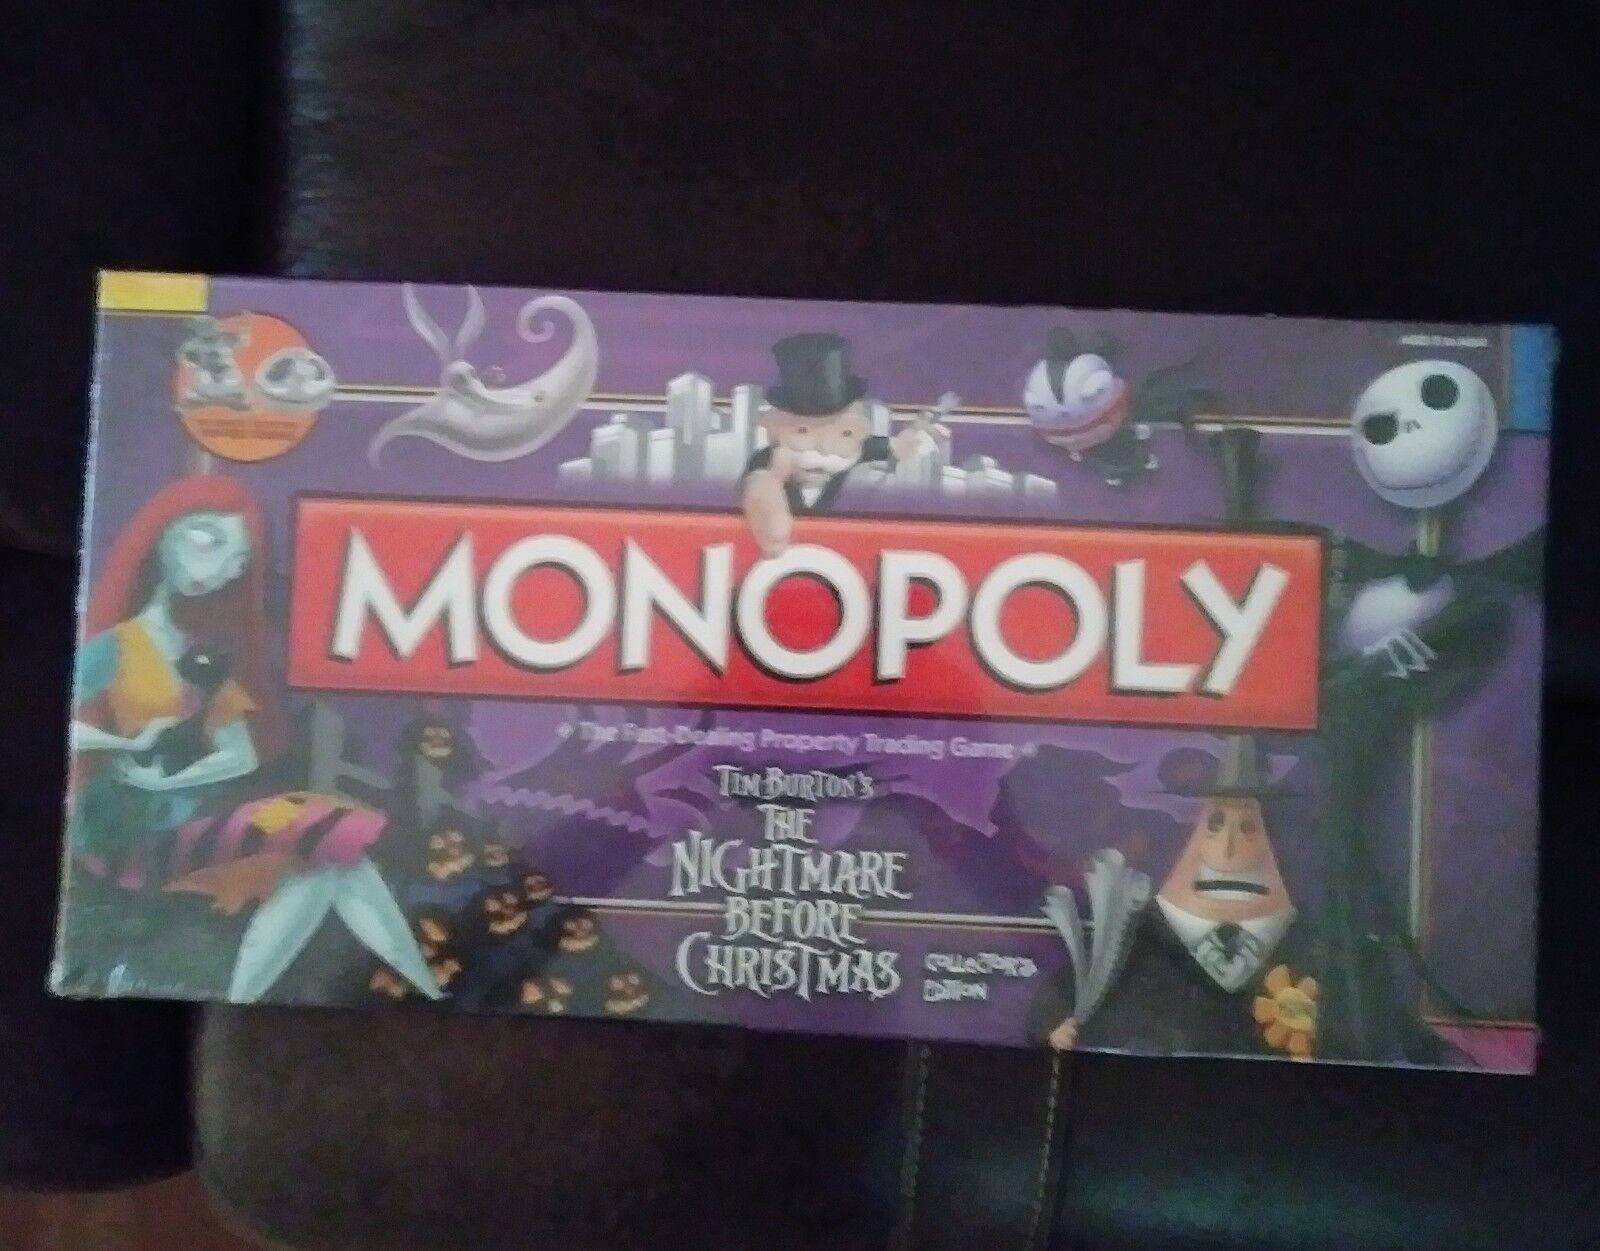 Monopoly ist collectors edition der nightmare before christmas fabrik versiegelt spiel